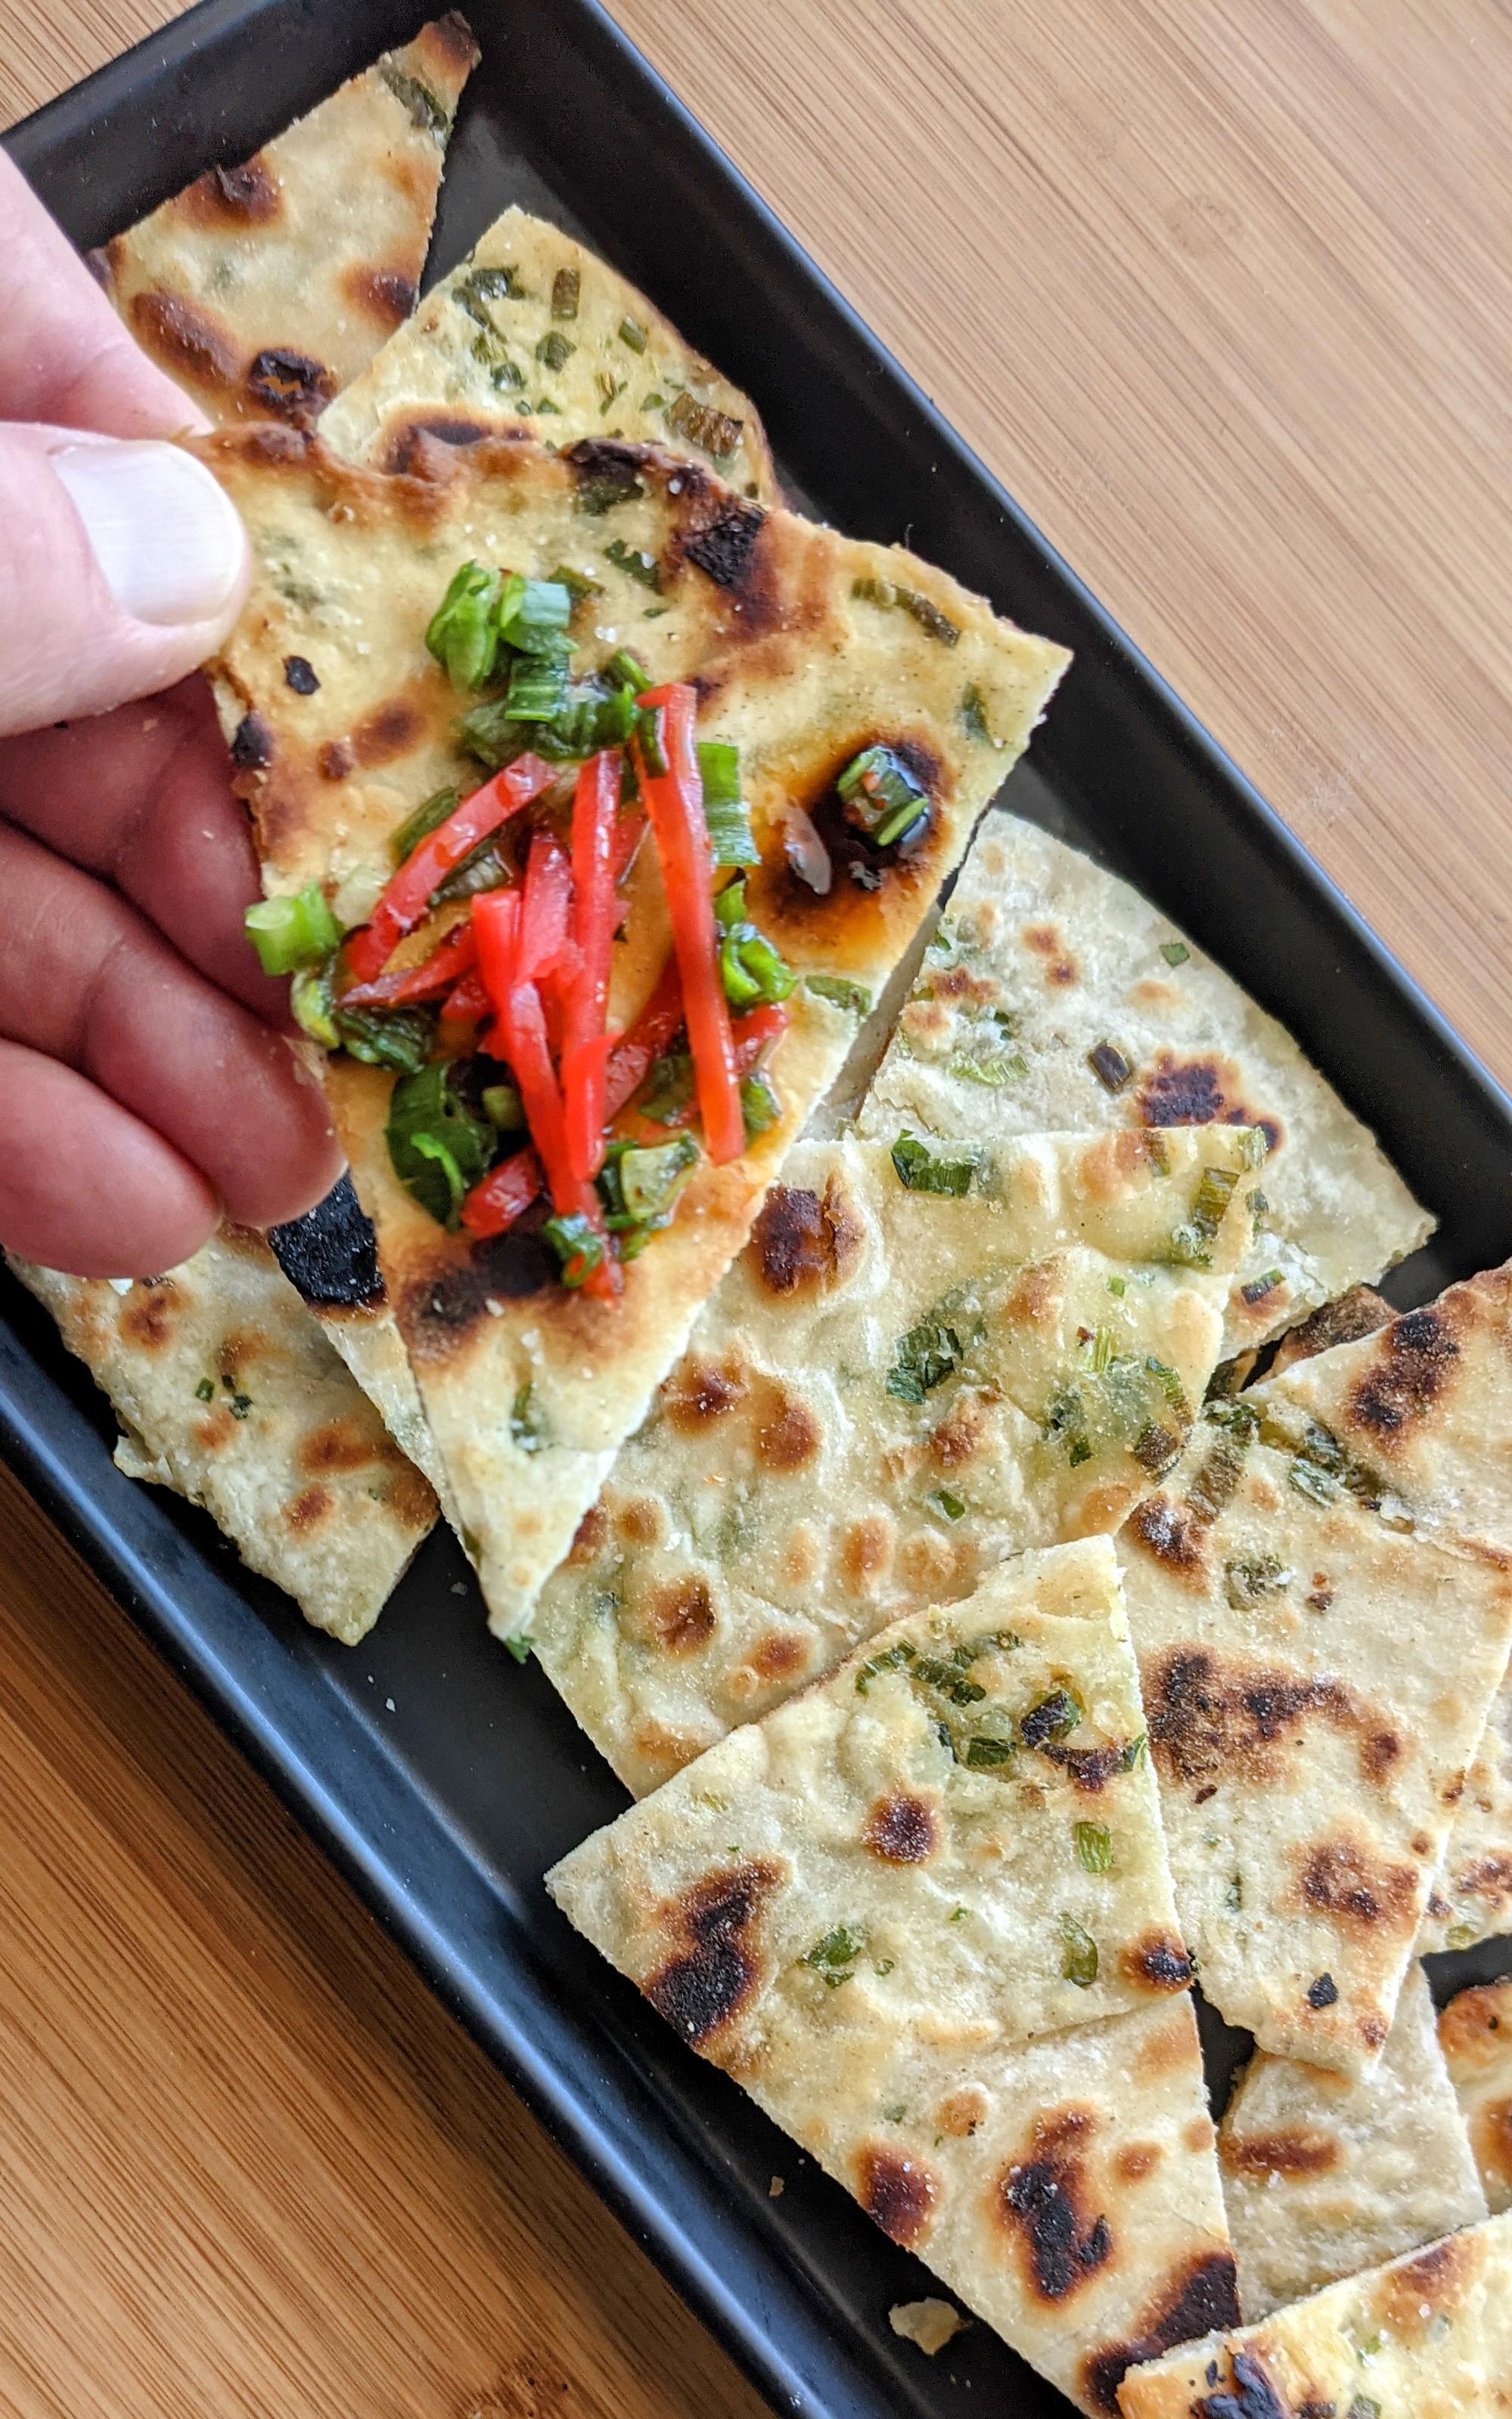 Chinese Scallion Pancakes DFKitchentime